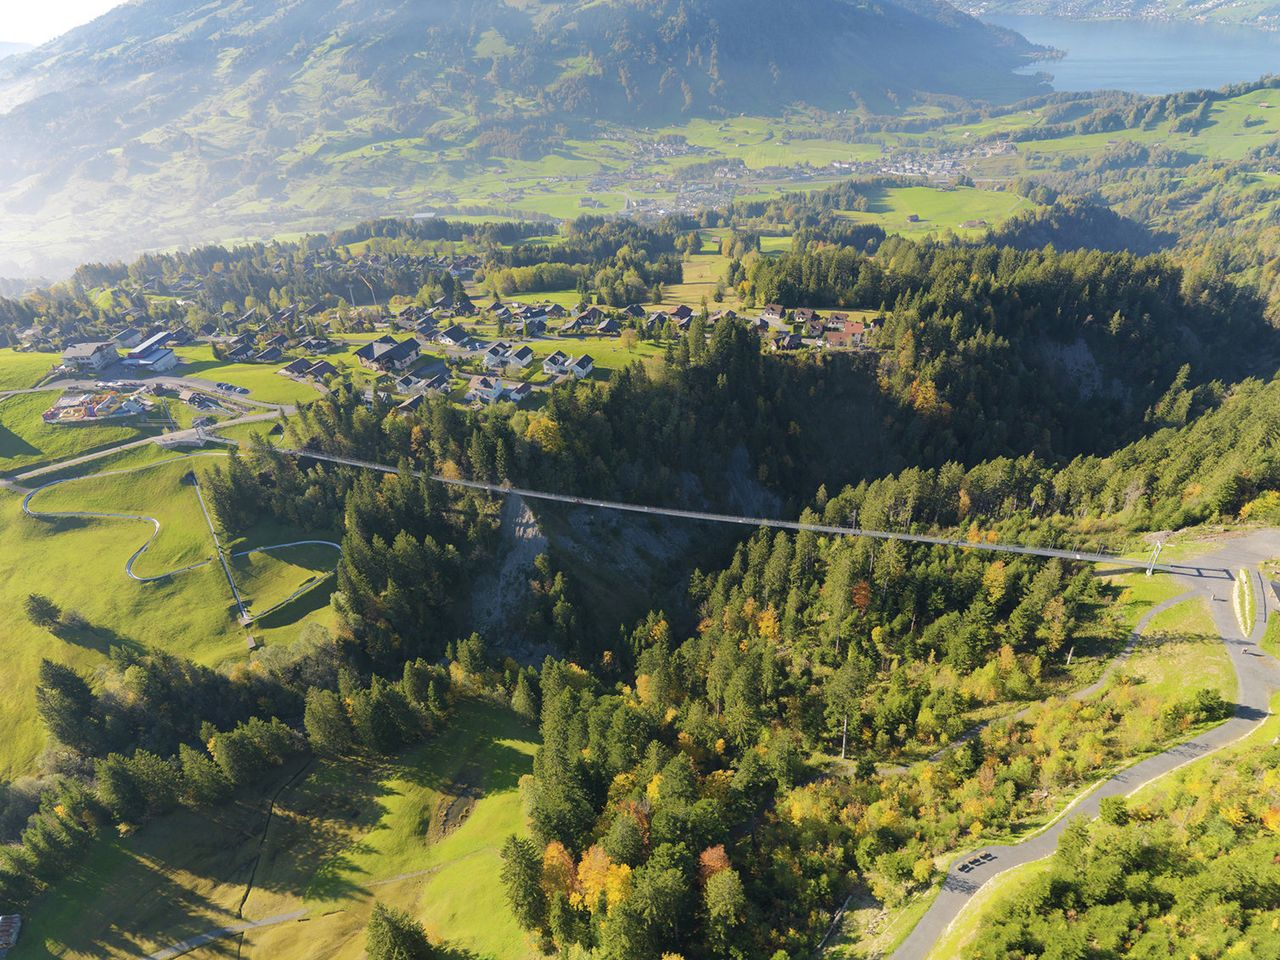 E) Etappe: Wildspitz – Sattel - Mostelberg